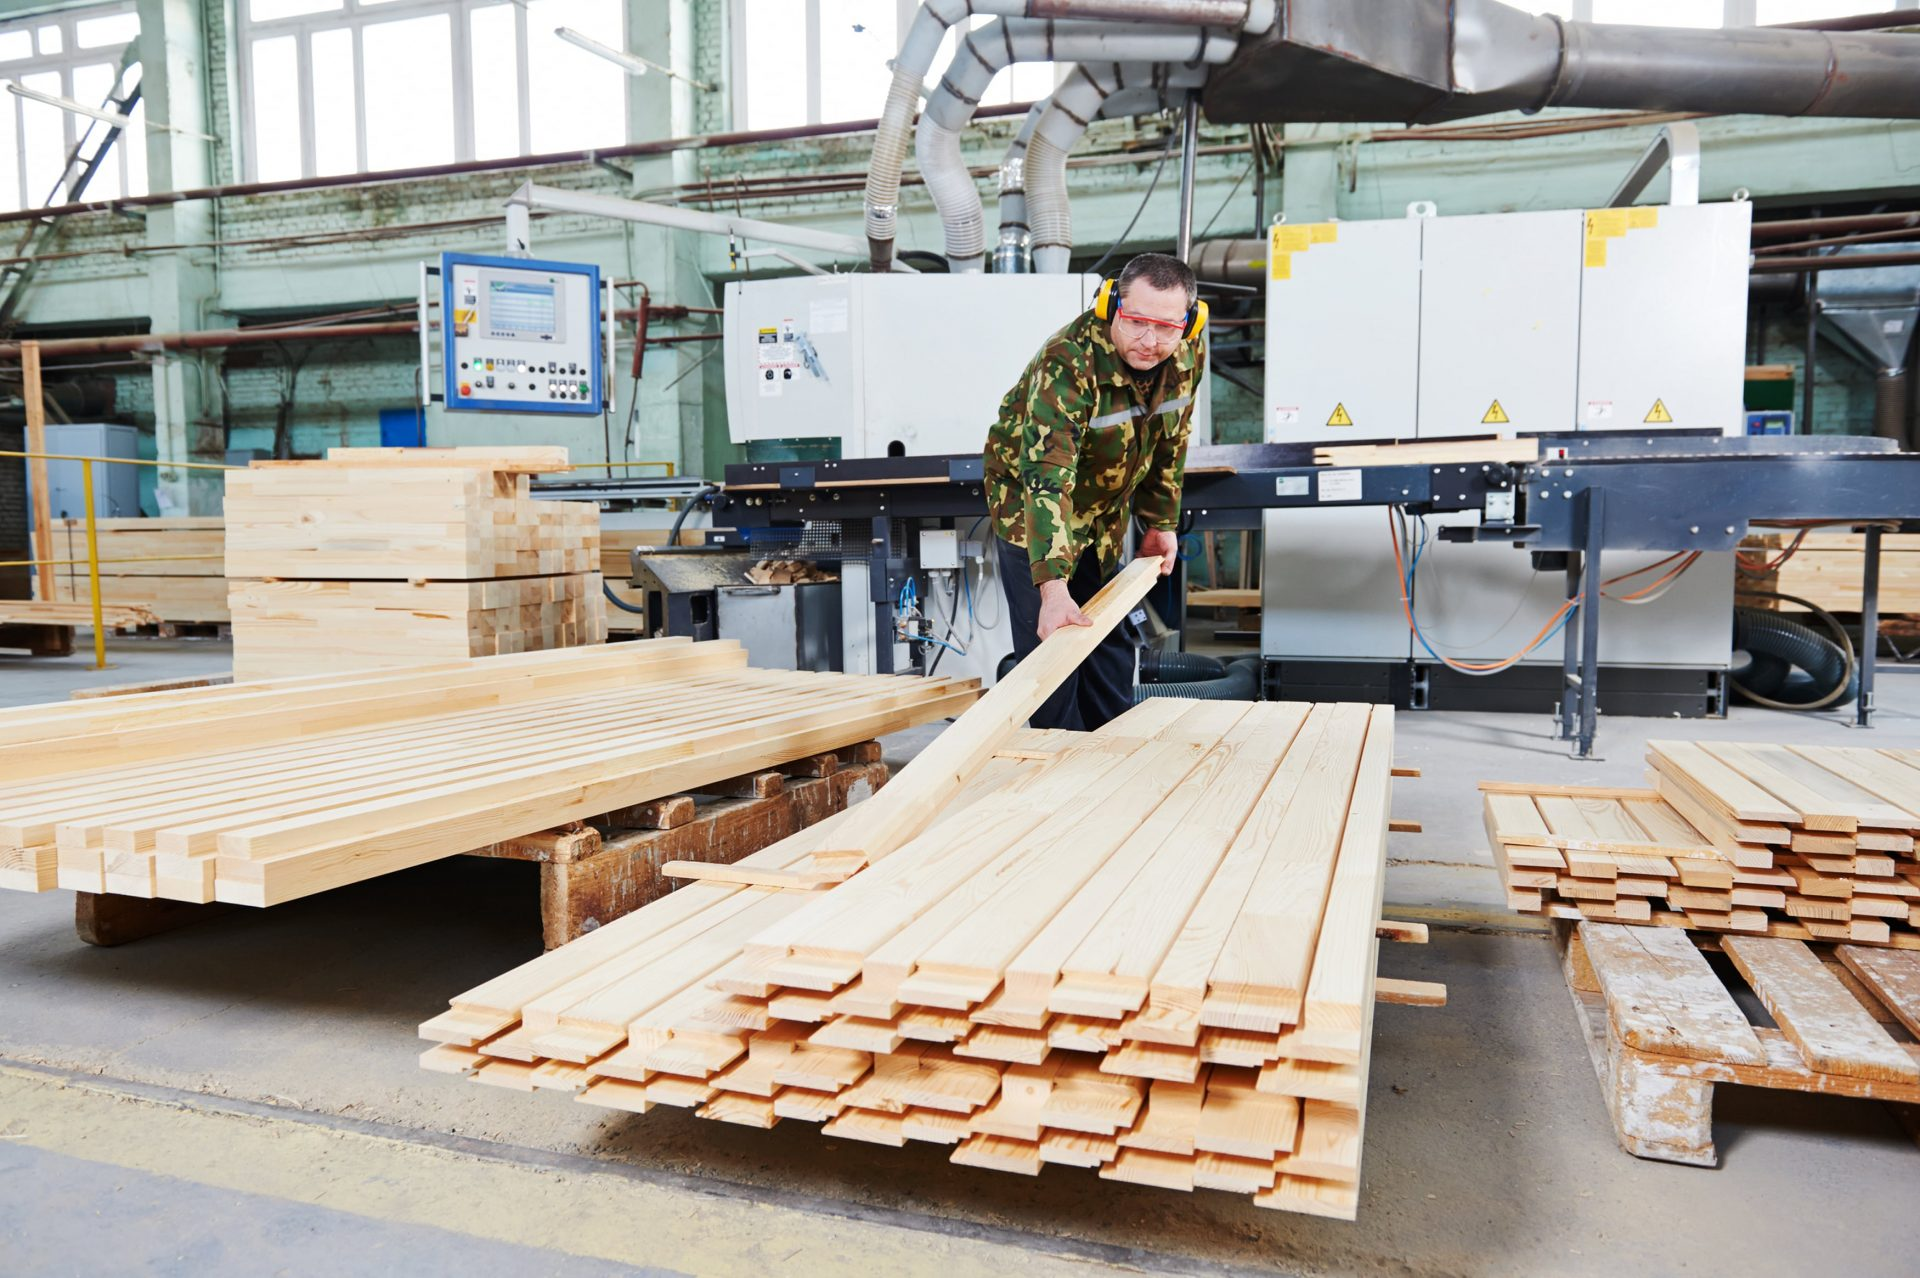 Man stacking wood in Patrick warehouse